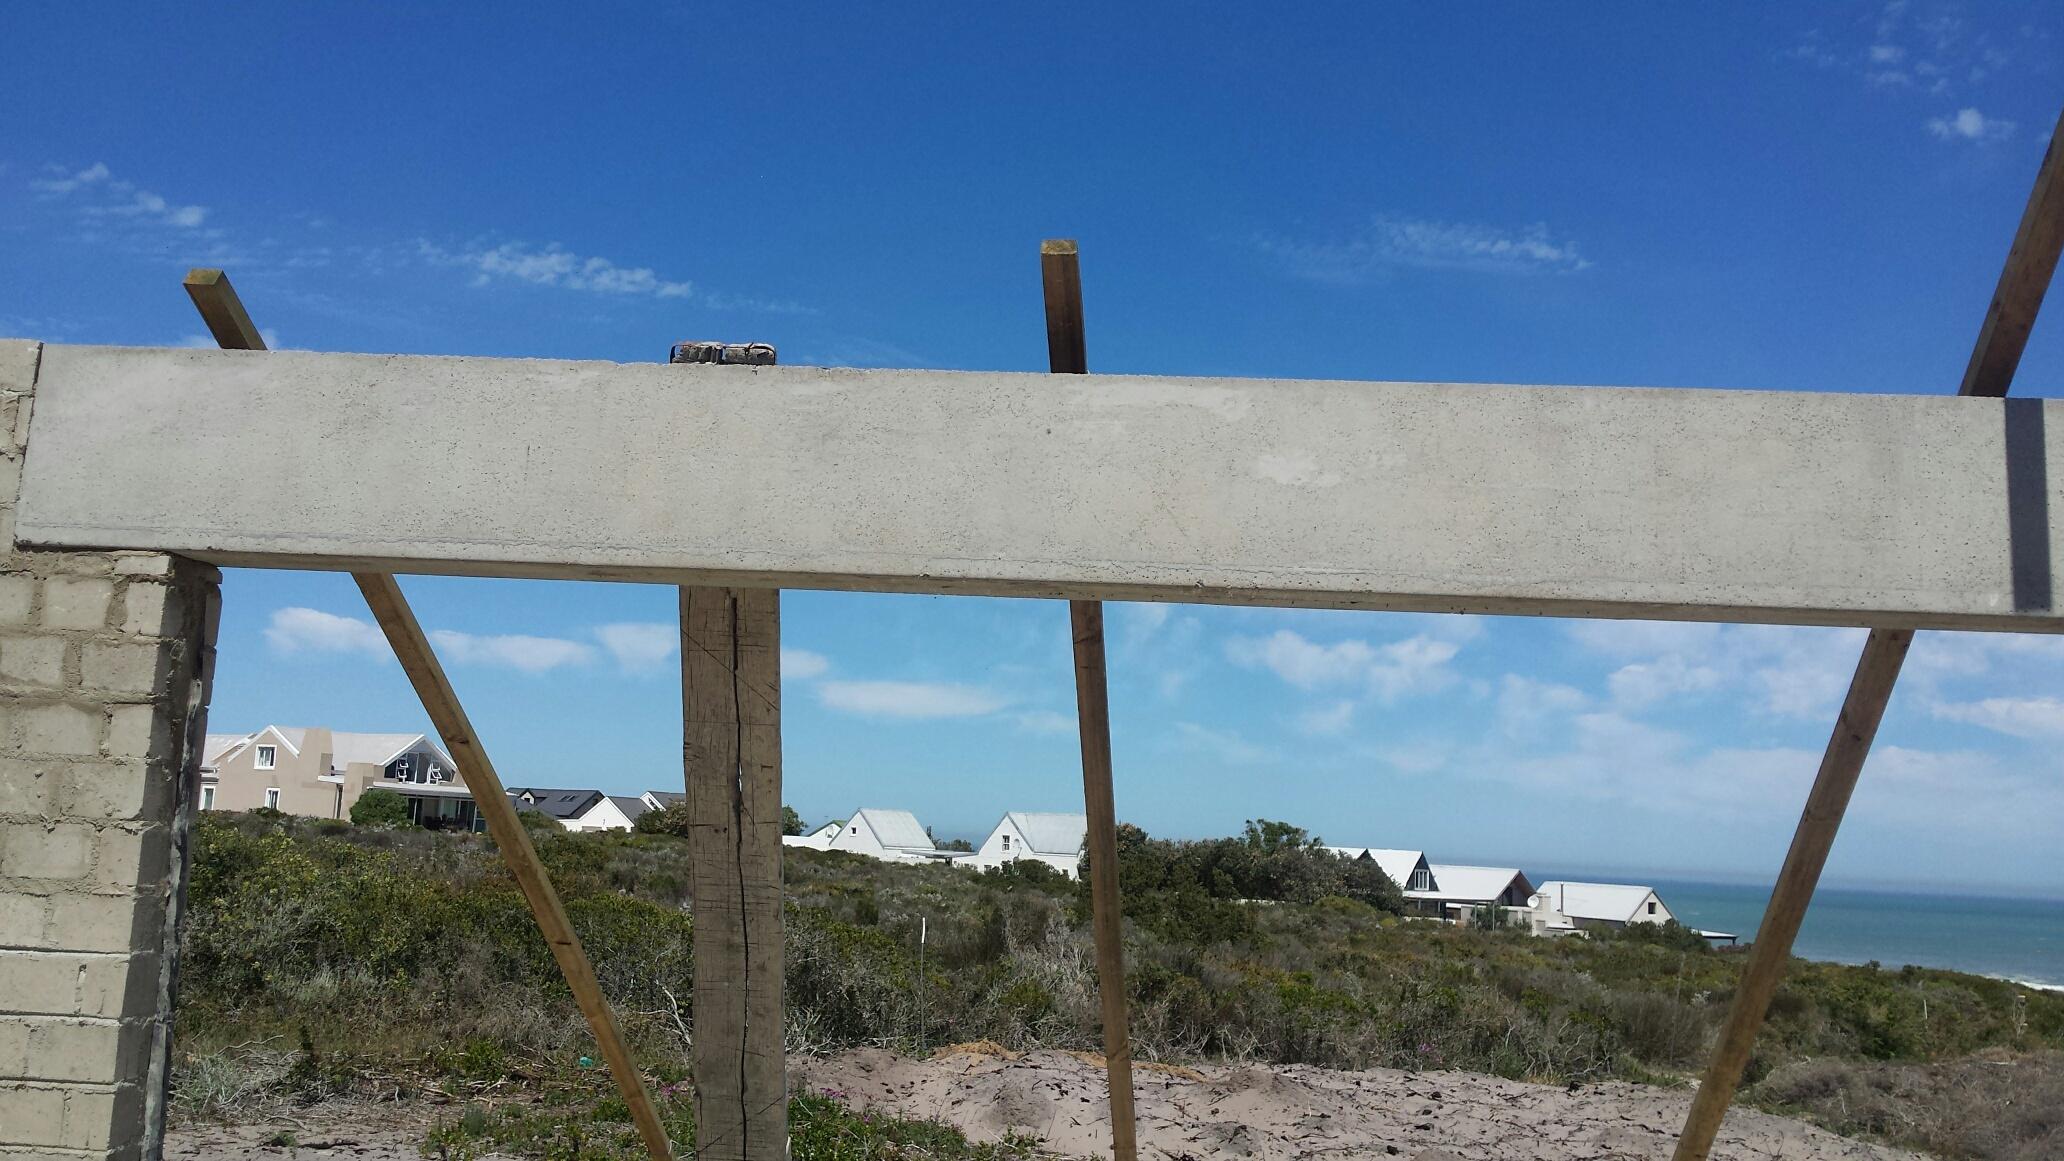 Cobute precast beam on site.